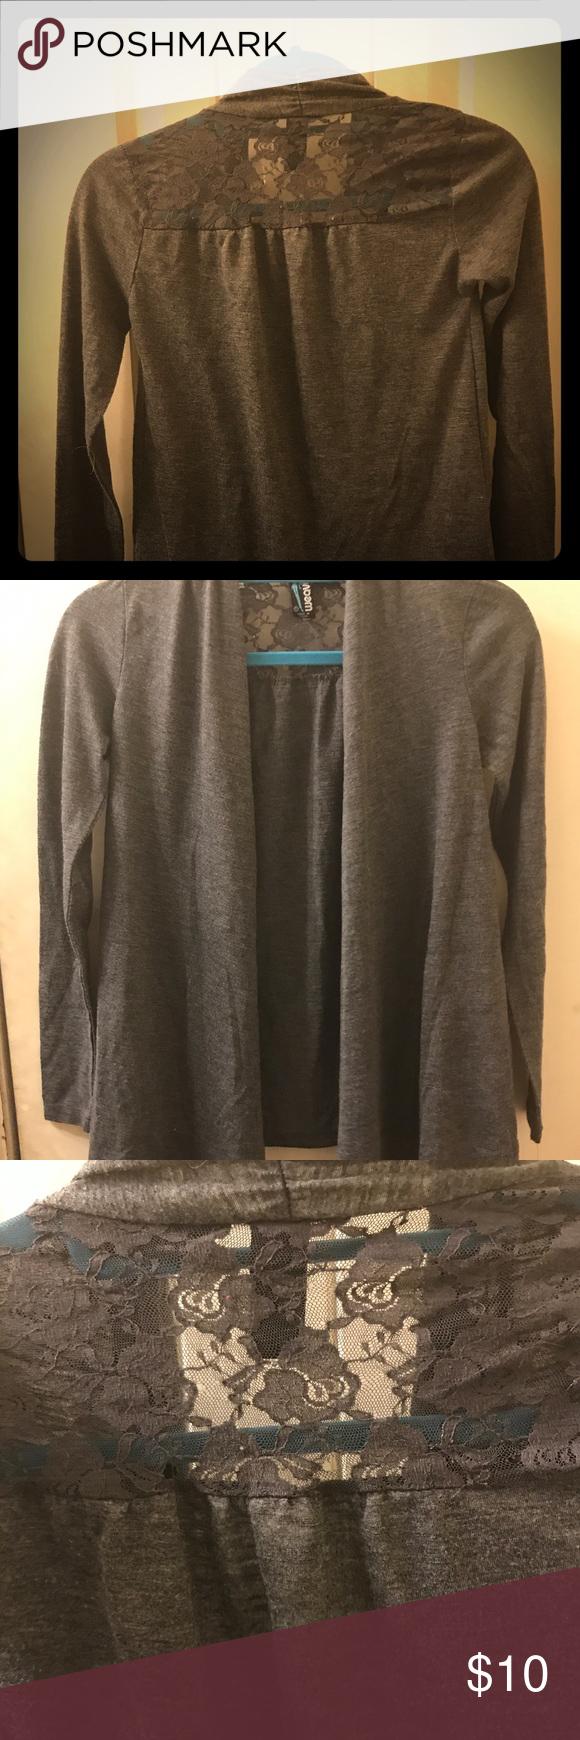 Grey Lacey Sweater My Posh Picks Pinterest Sweaters Dressy